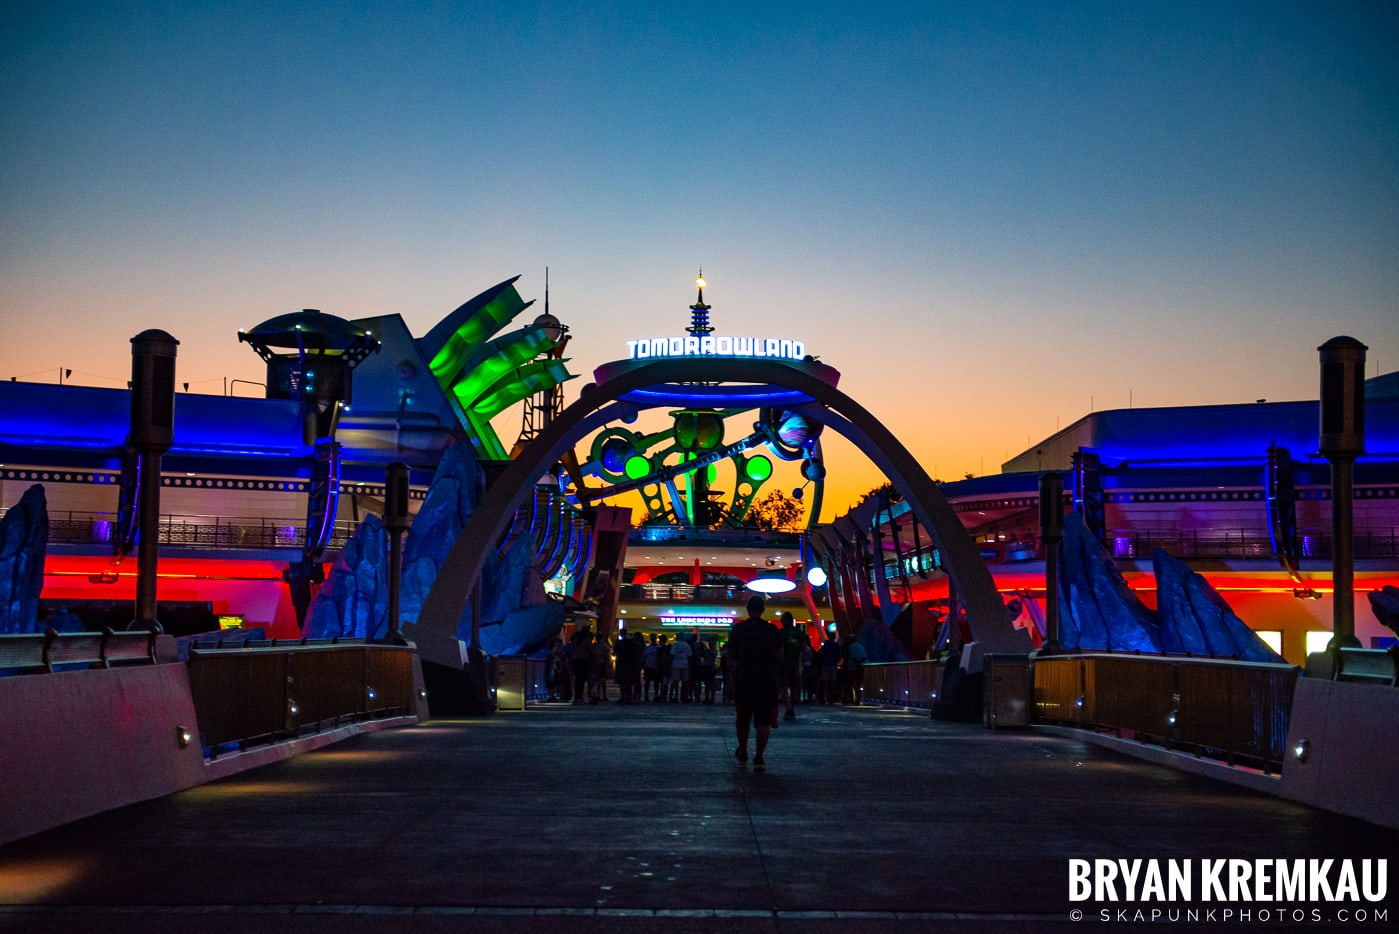 Walt Disney World Vacation: Days 1 & 2 (Disney Springs & Magic Kingdom, Epcot) September 29th - 30th 2019 (27)